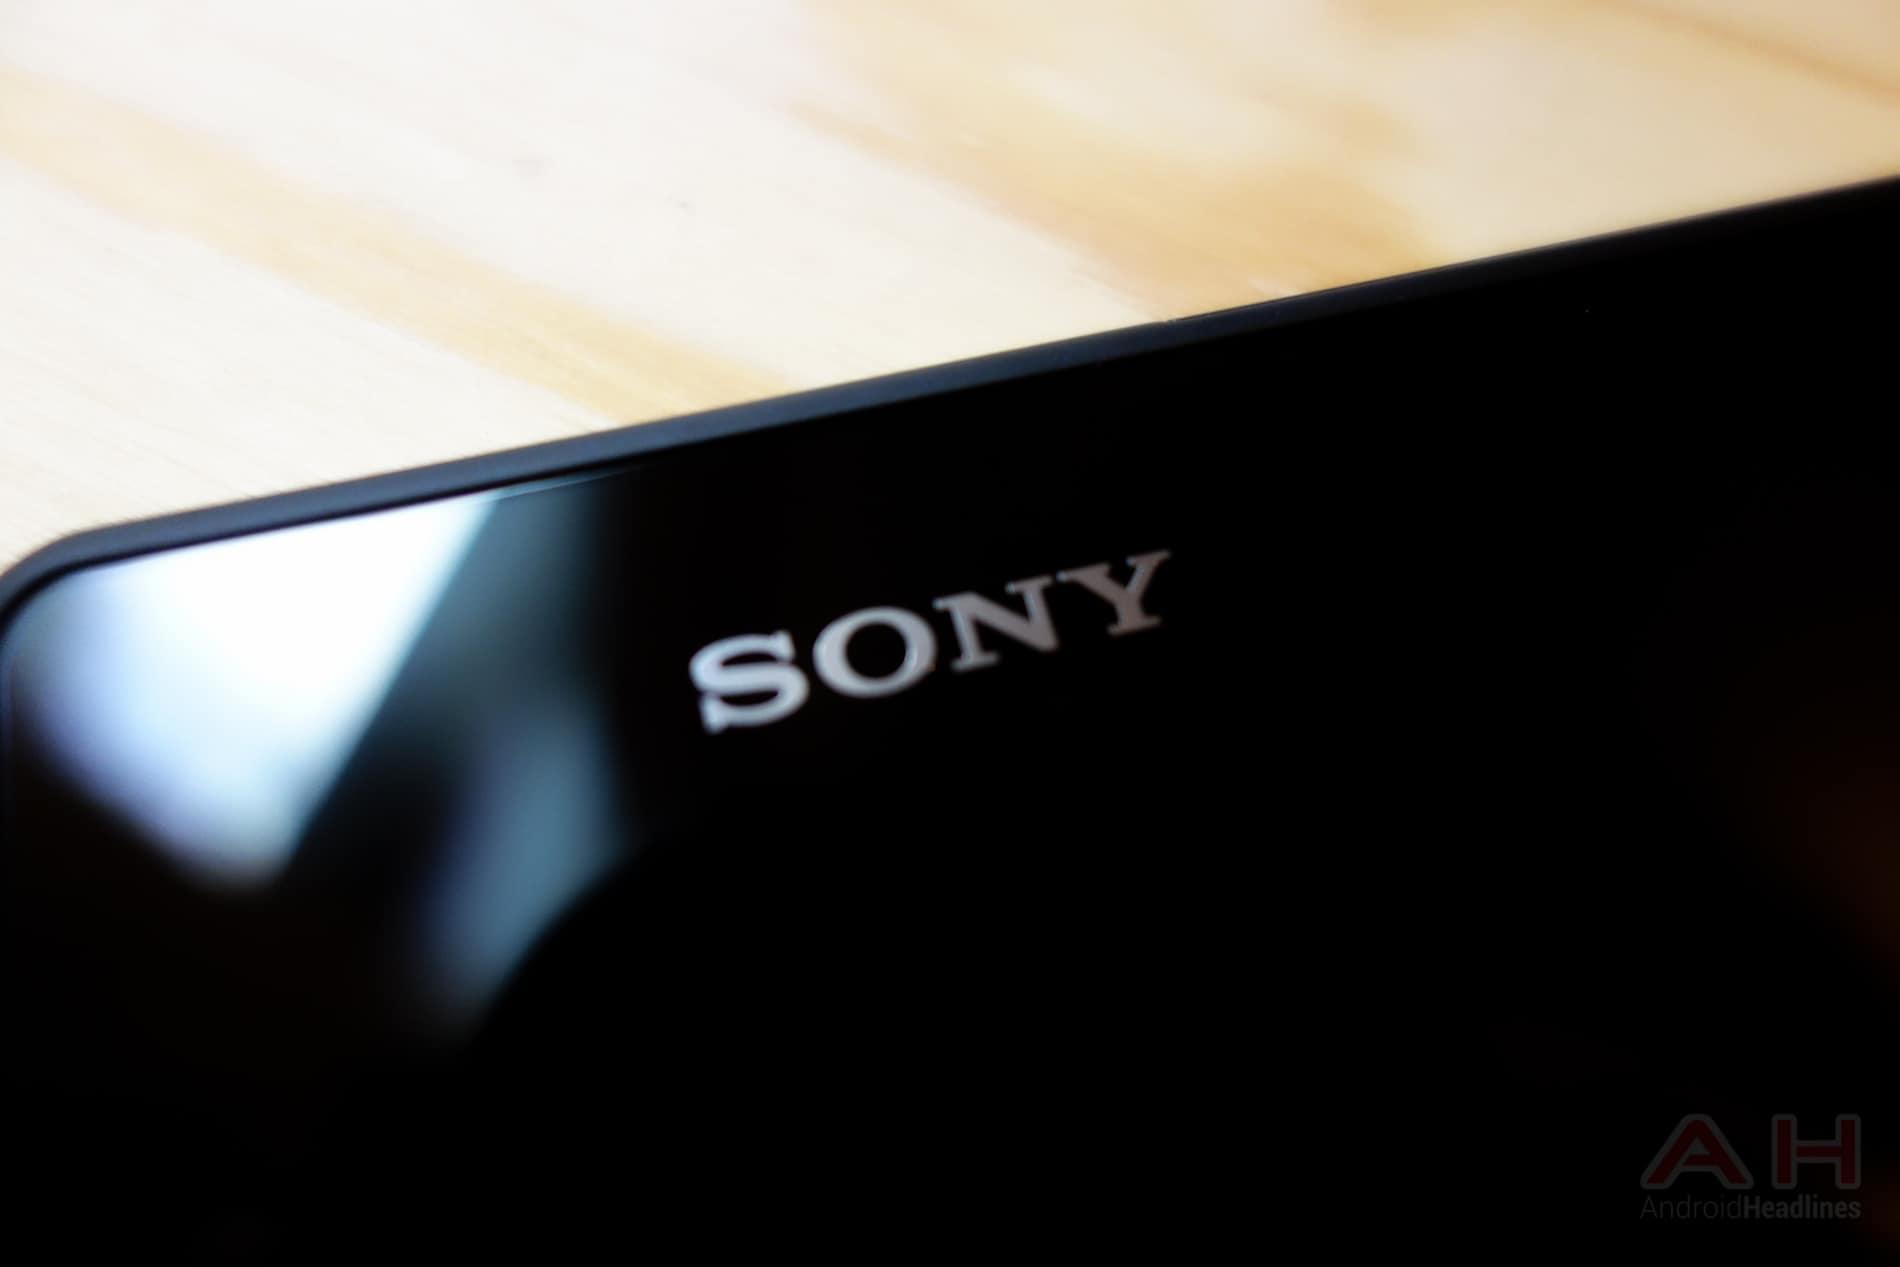 Sony-Xperia-Z2-Tablet-AH-5